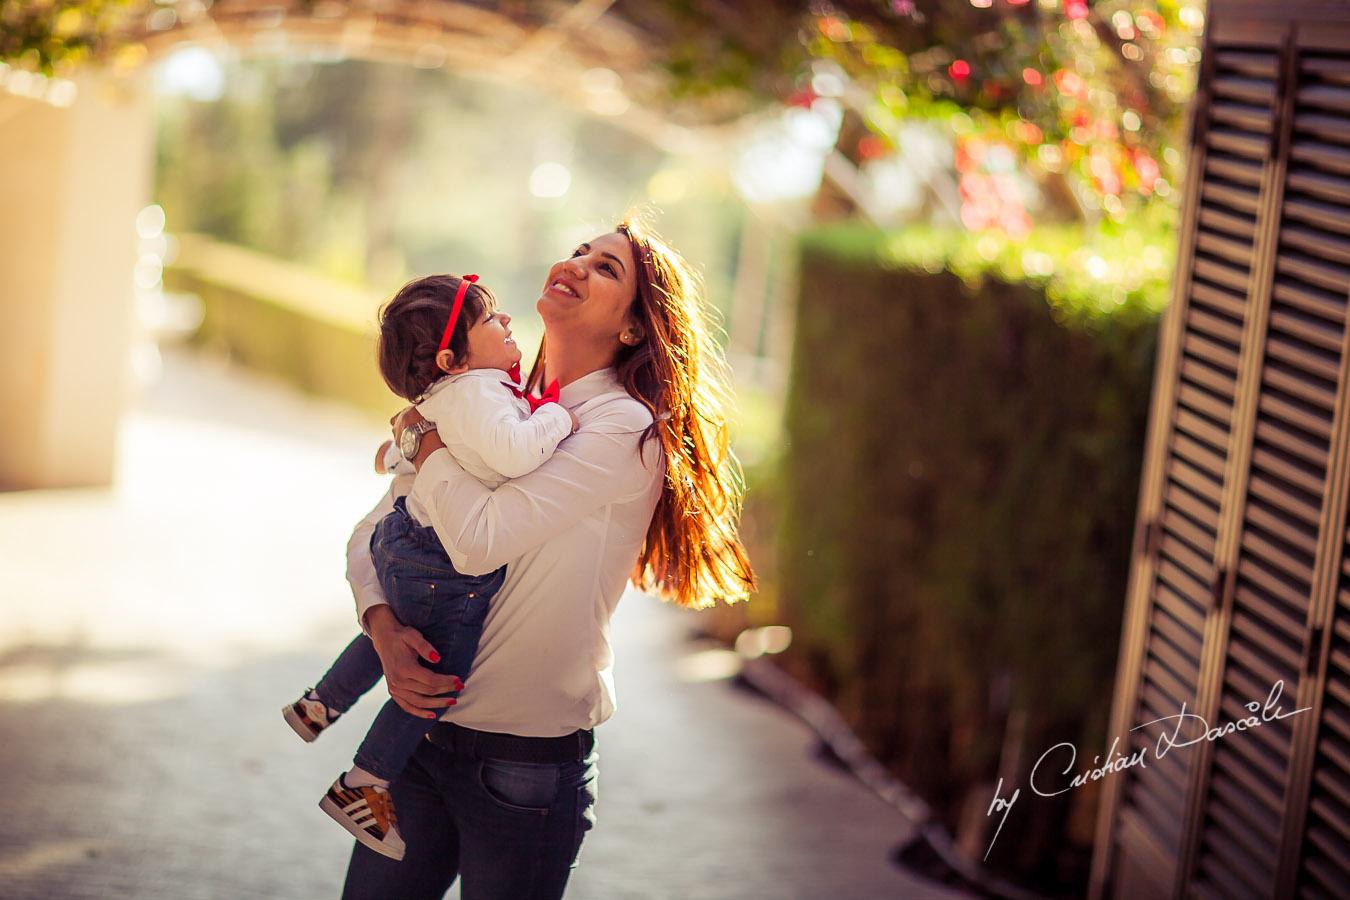 Family Photos in Cyprus , 4 Seasons, Limassol. Photographer: Cristian Dascalu